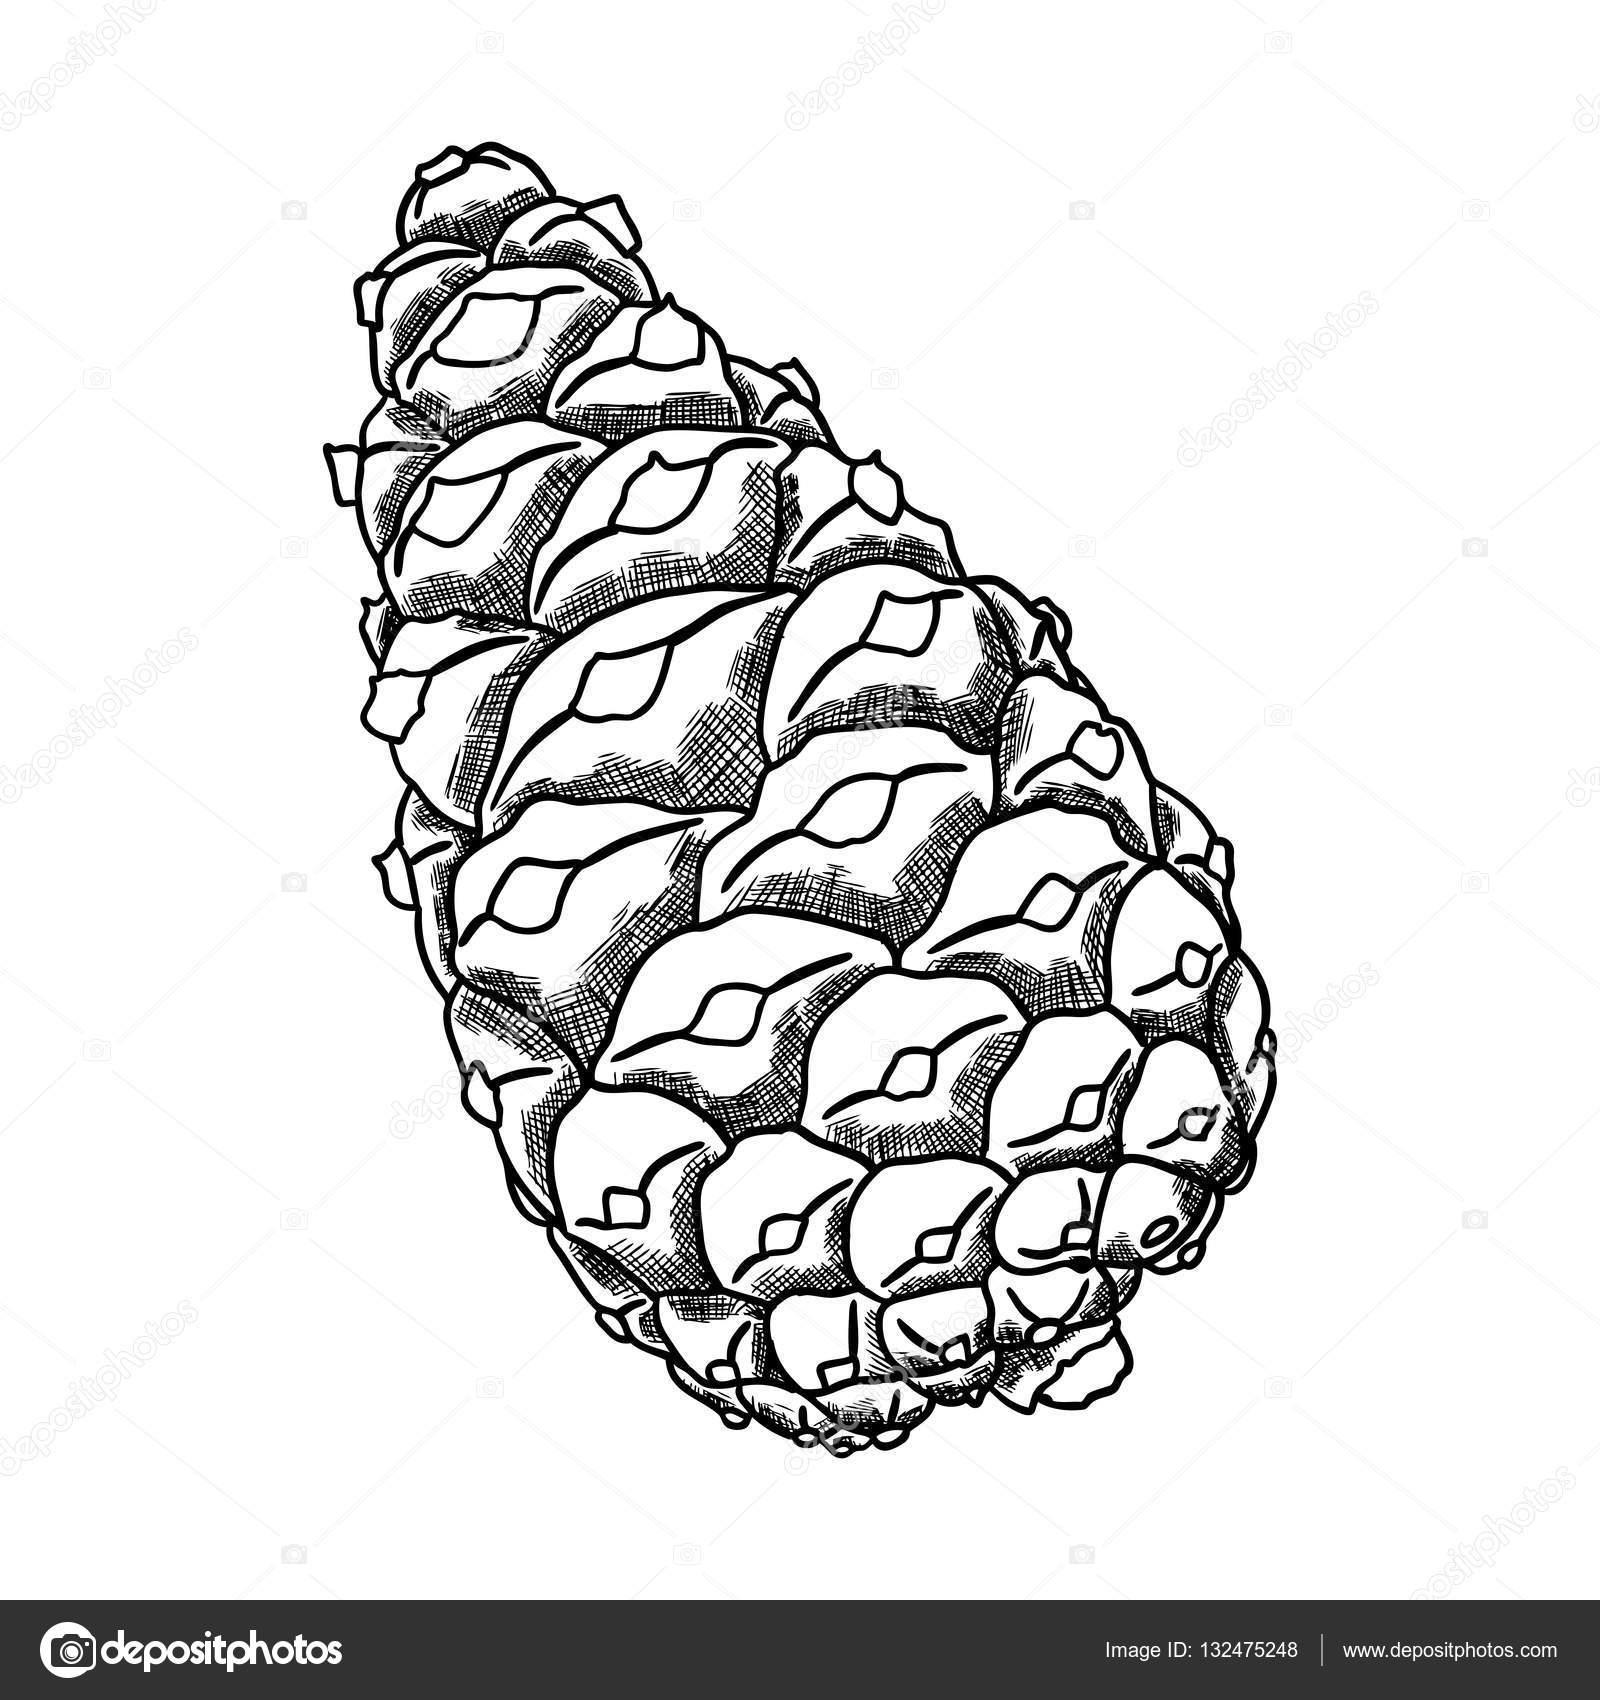 Imágenes Pino Para Dibujar Cono De Pino Dibujo Mano Foto De